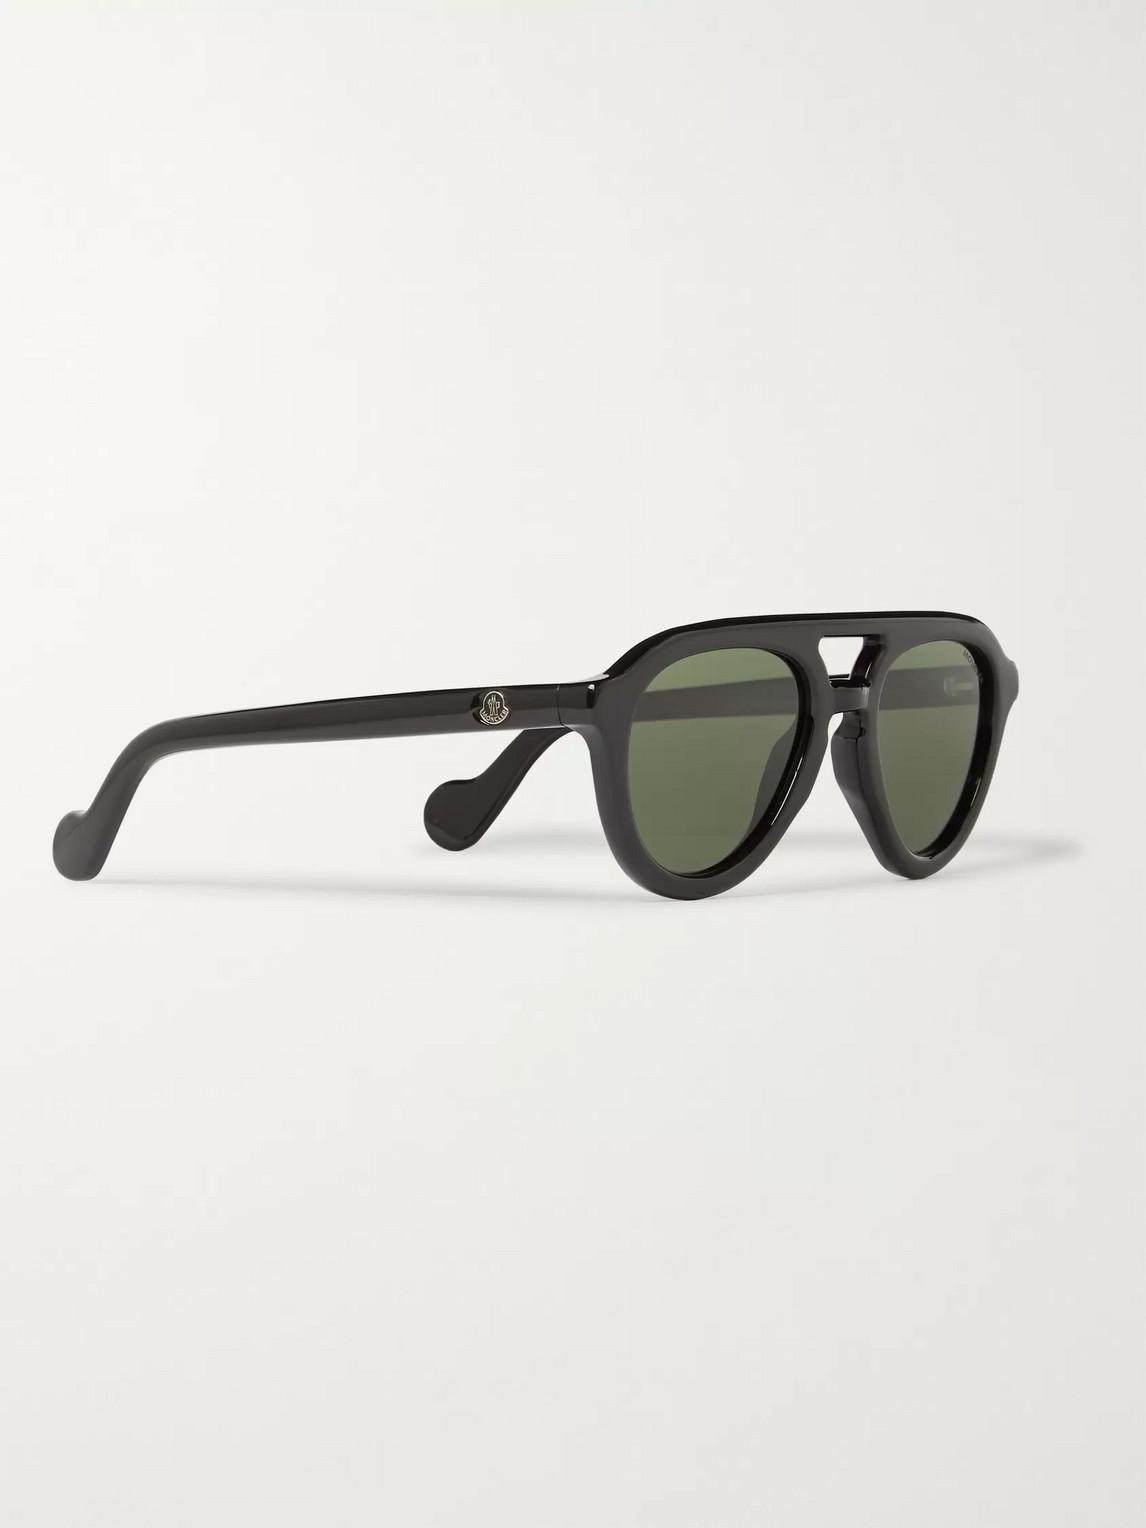 Moncler Sunglasses AVIATOR-STYLE ACETATE POLARISED SUNGLASSES